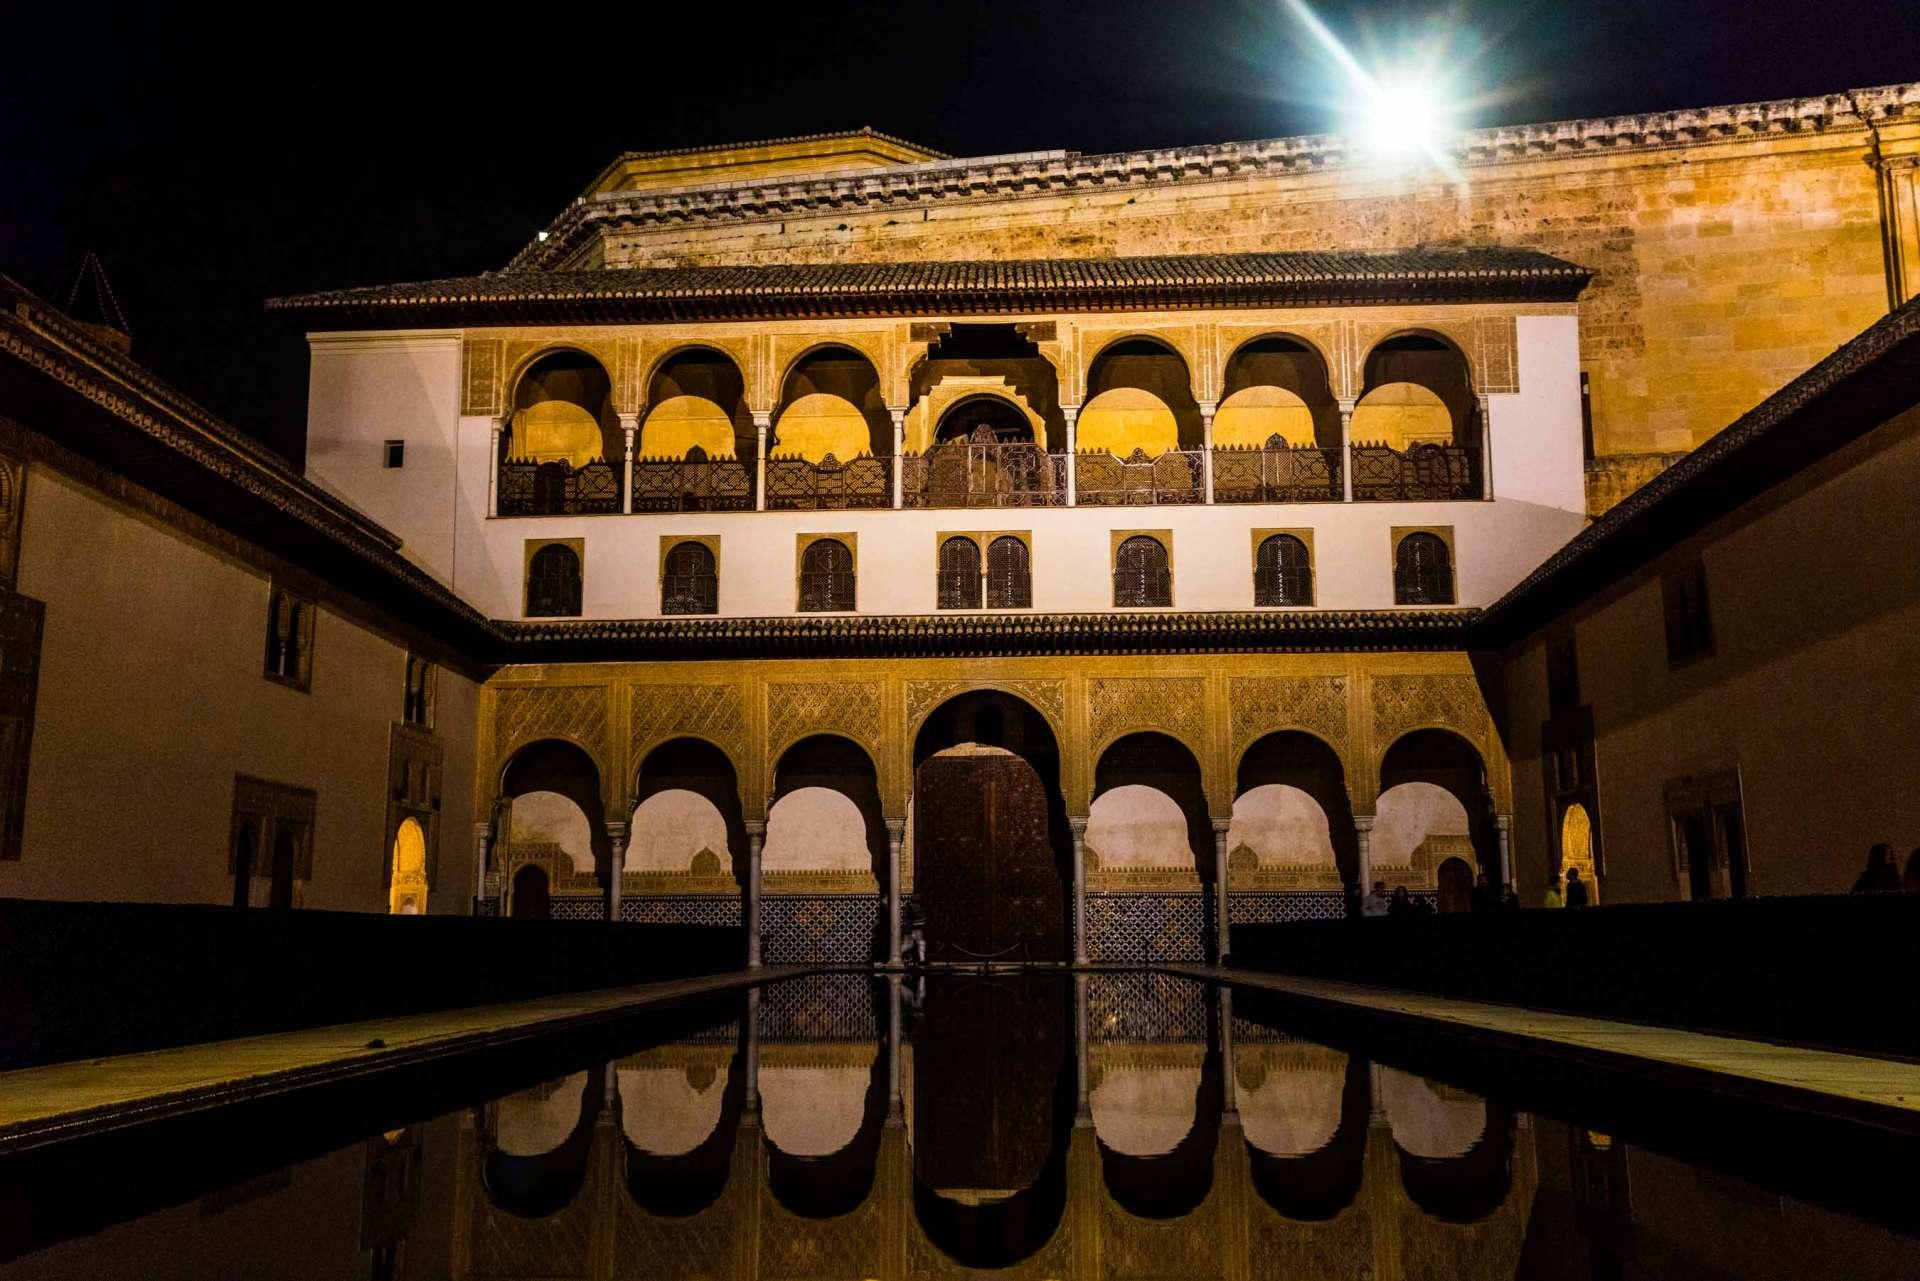 Granada Alhambra - by night